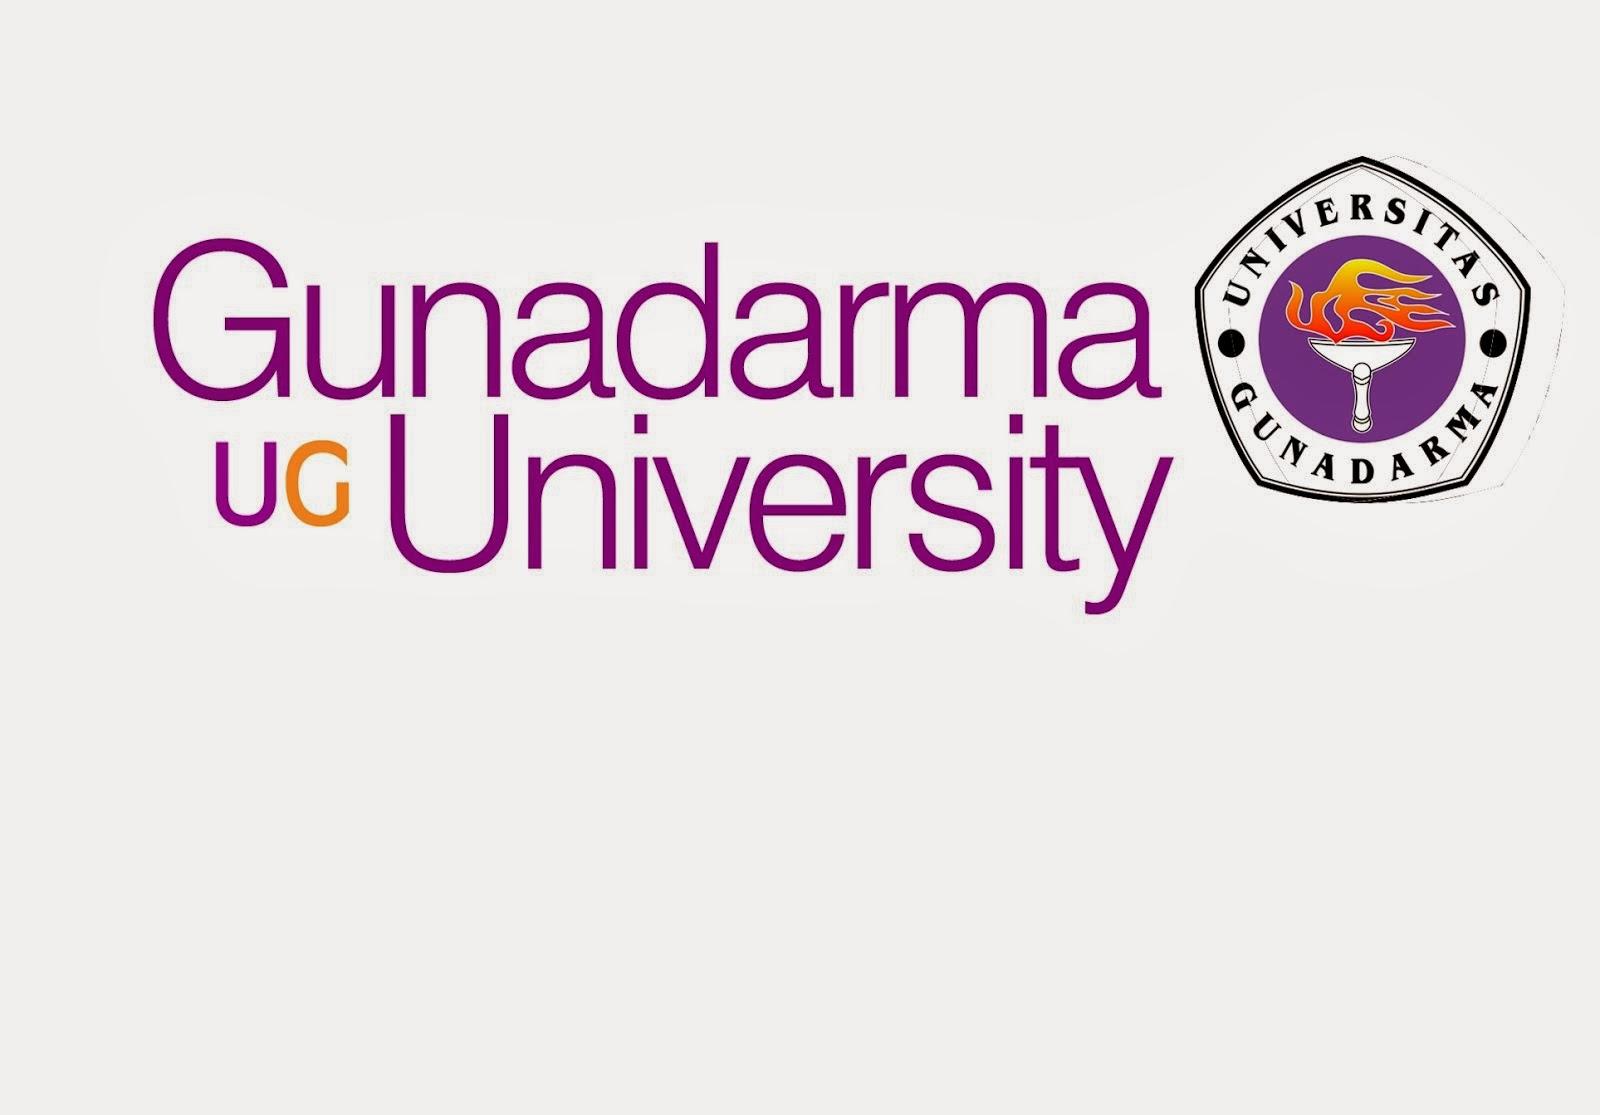 University of Gunadarma